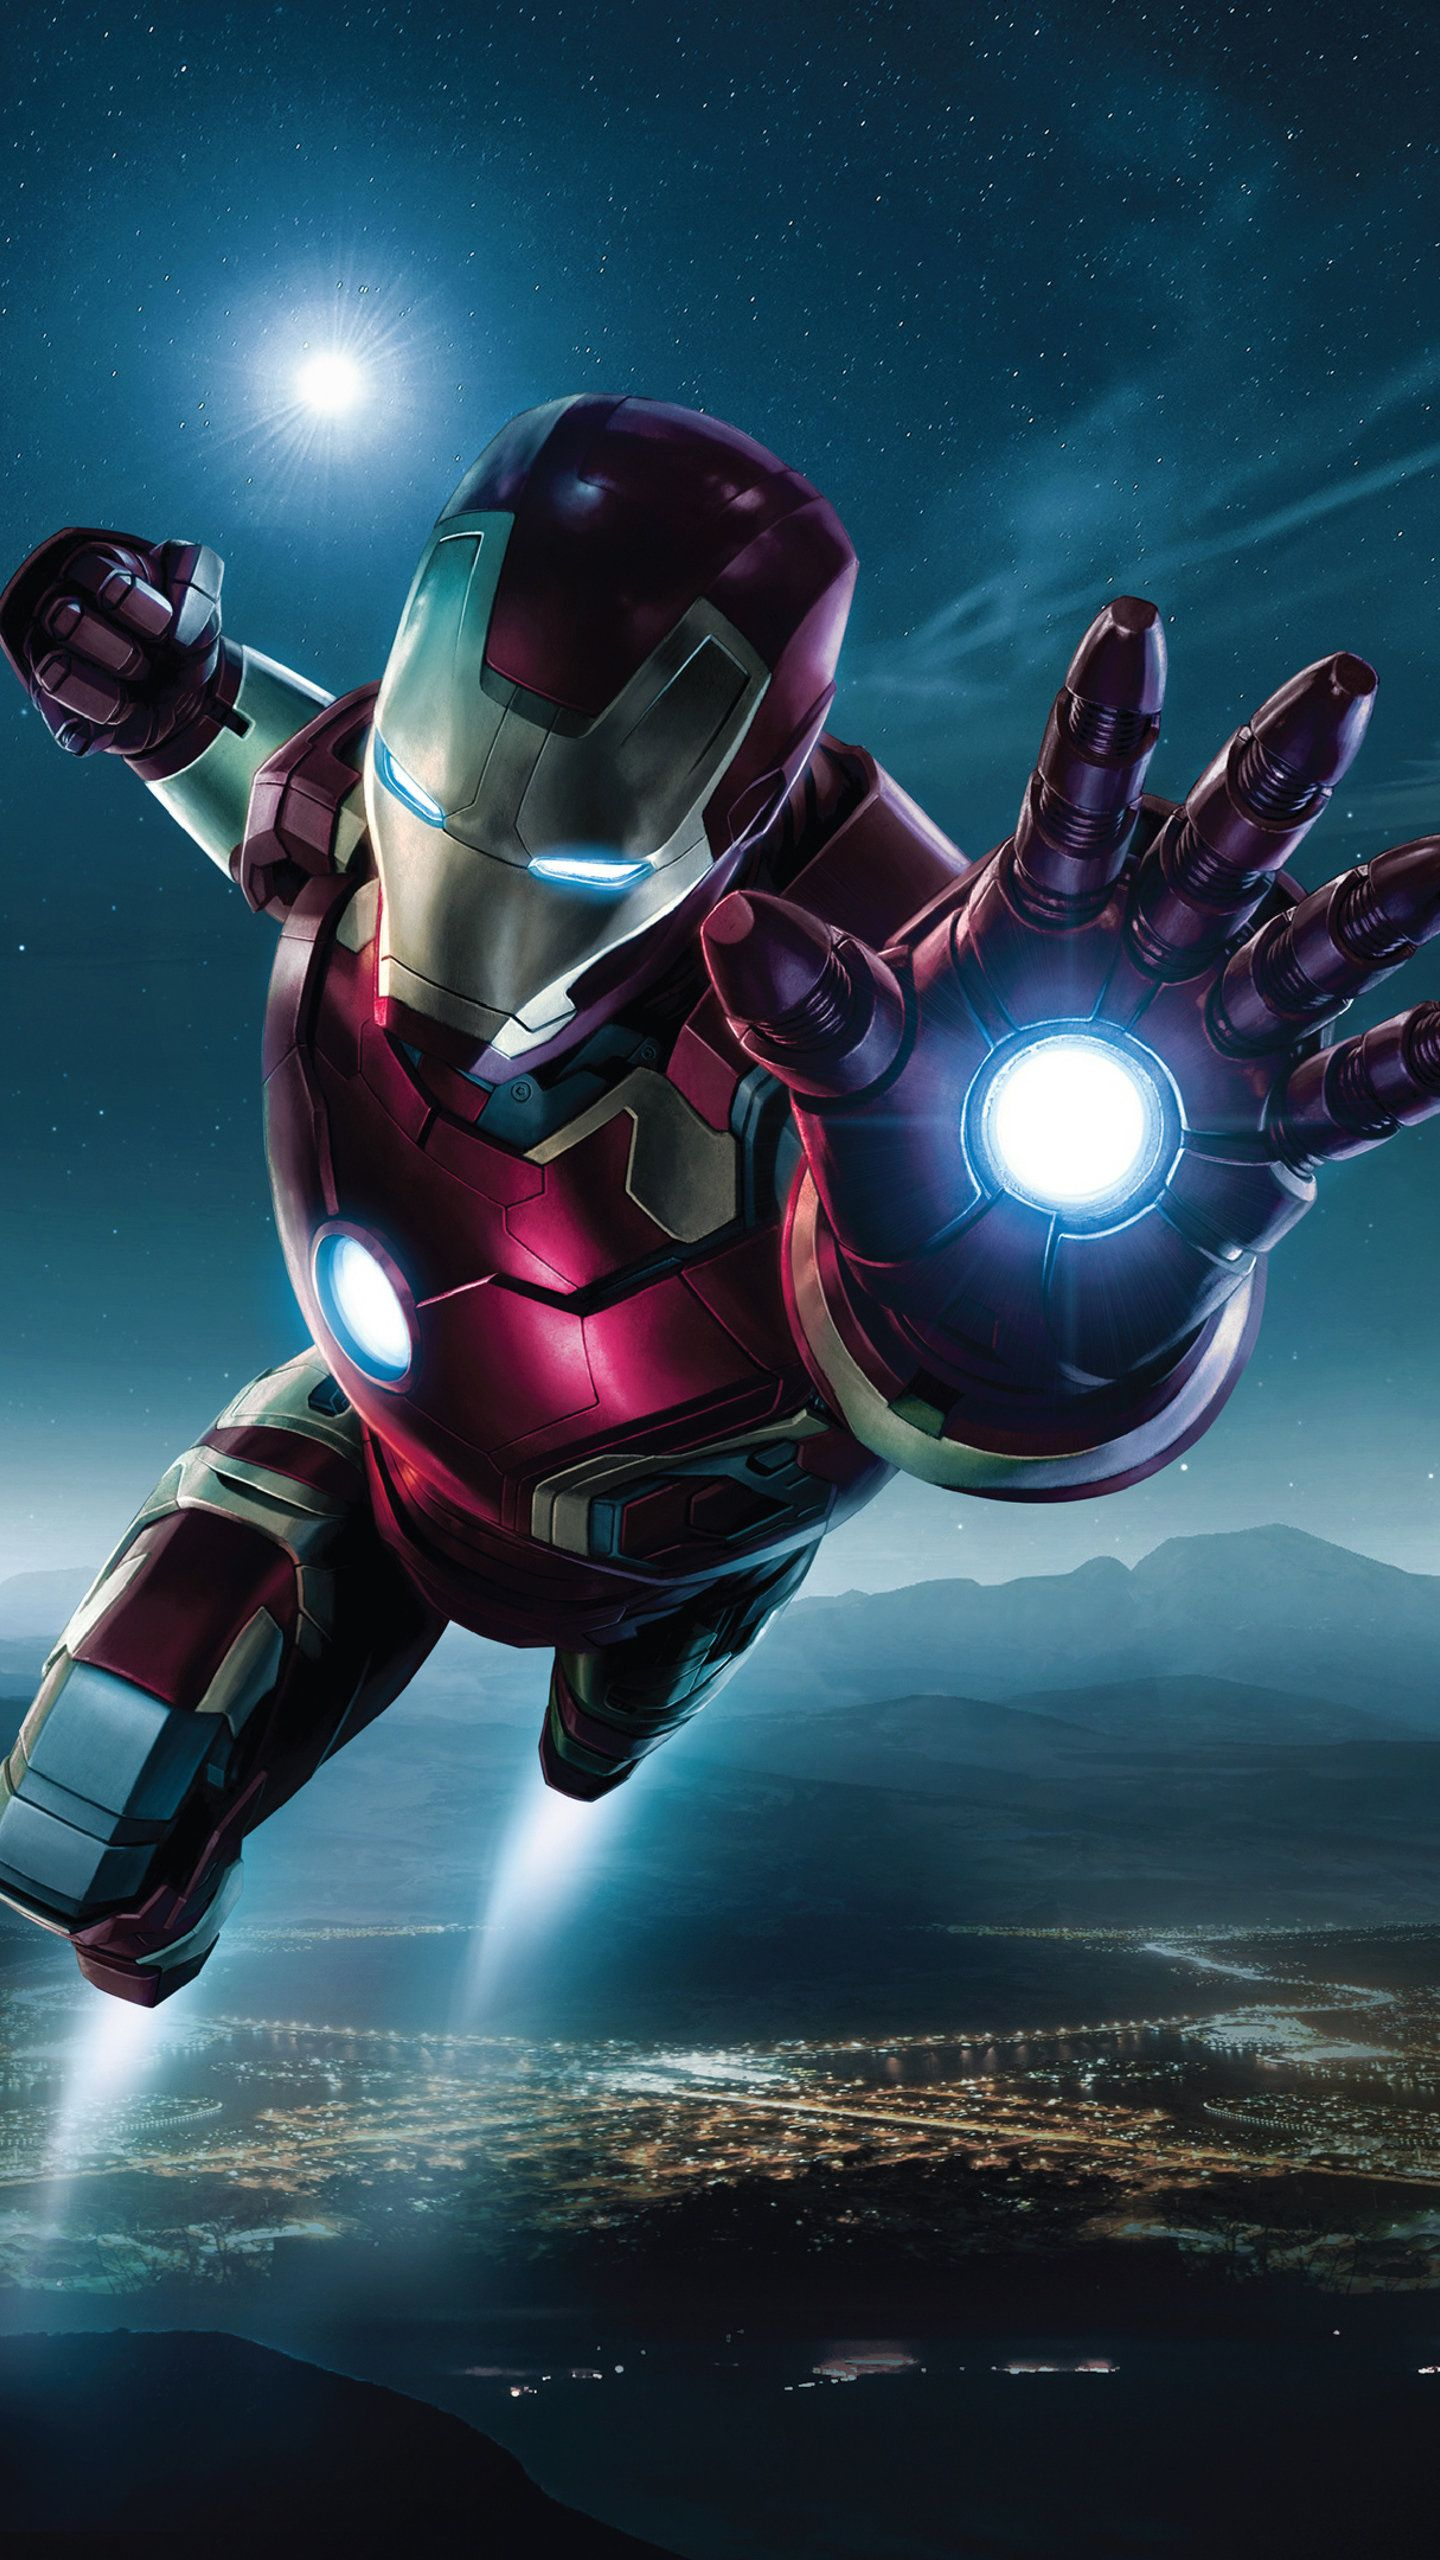 Pin Em 30 Best Iron Man Wallpapers 2019 Ultra hd iphone ultra hd iron man